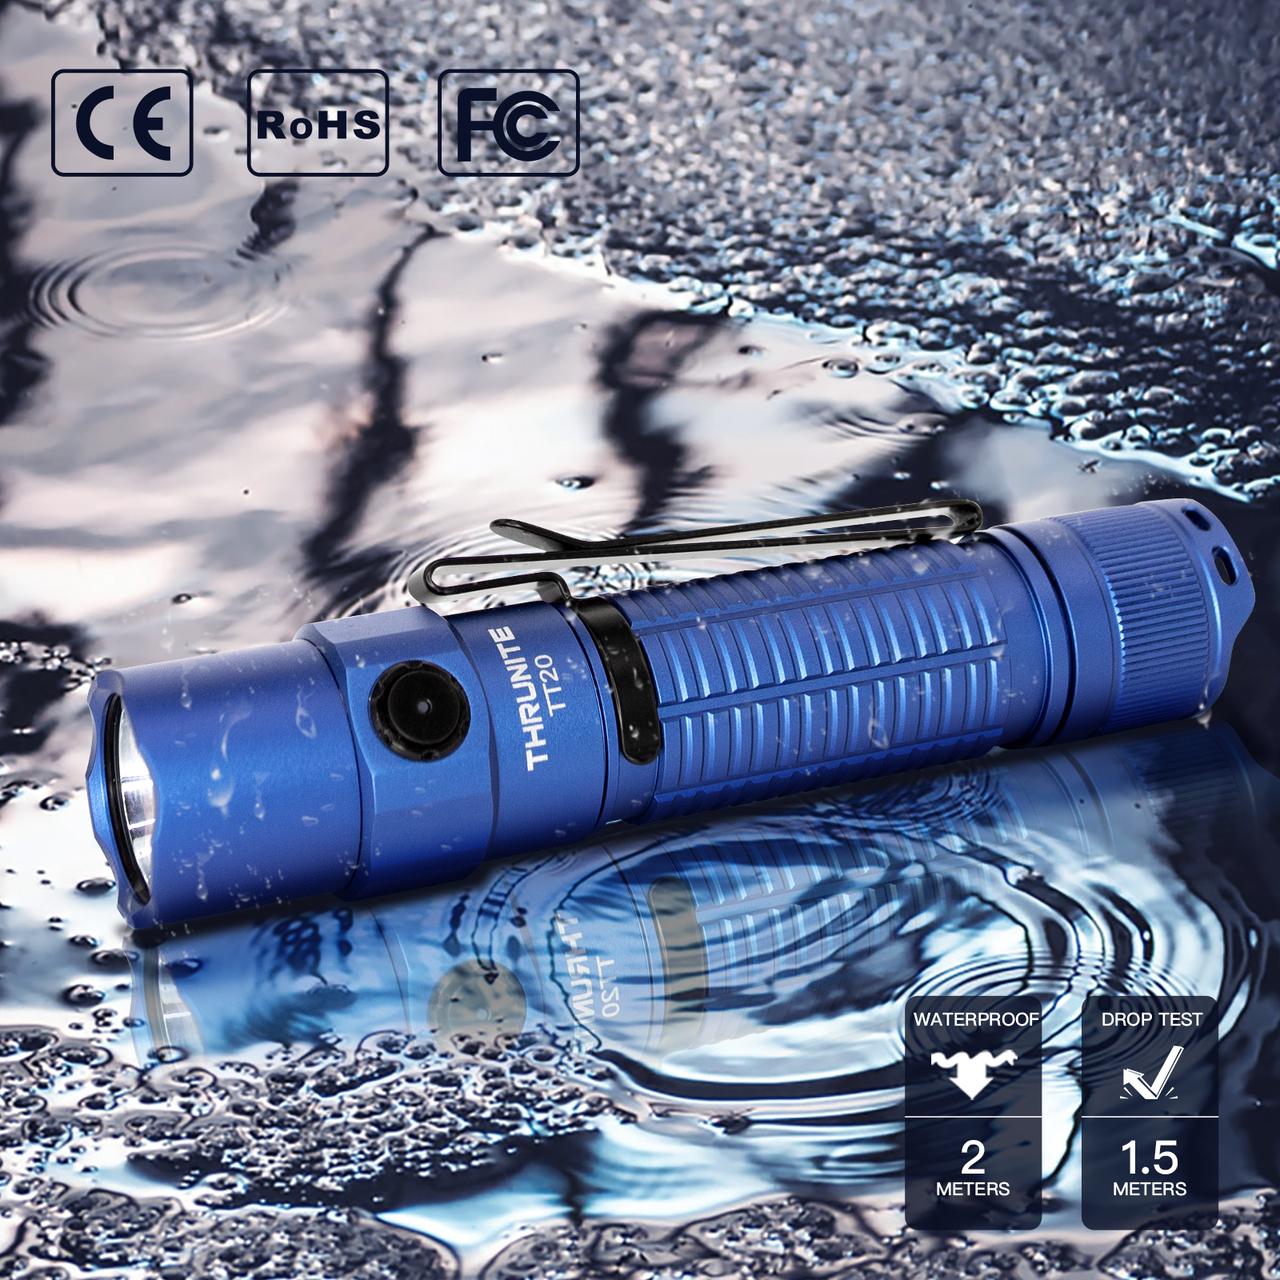 ThruNite TT20 'Ocean Blue' inkl. 21700 Akku in kaltweiss